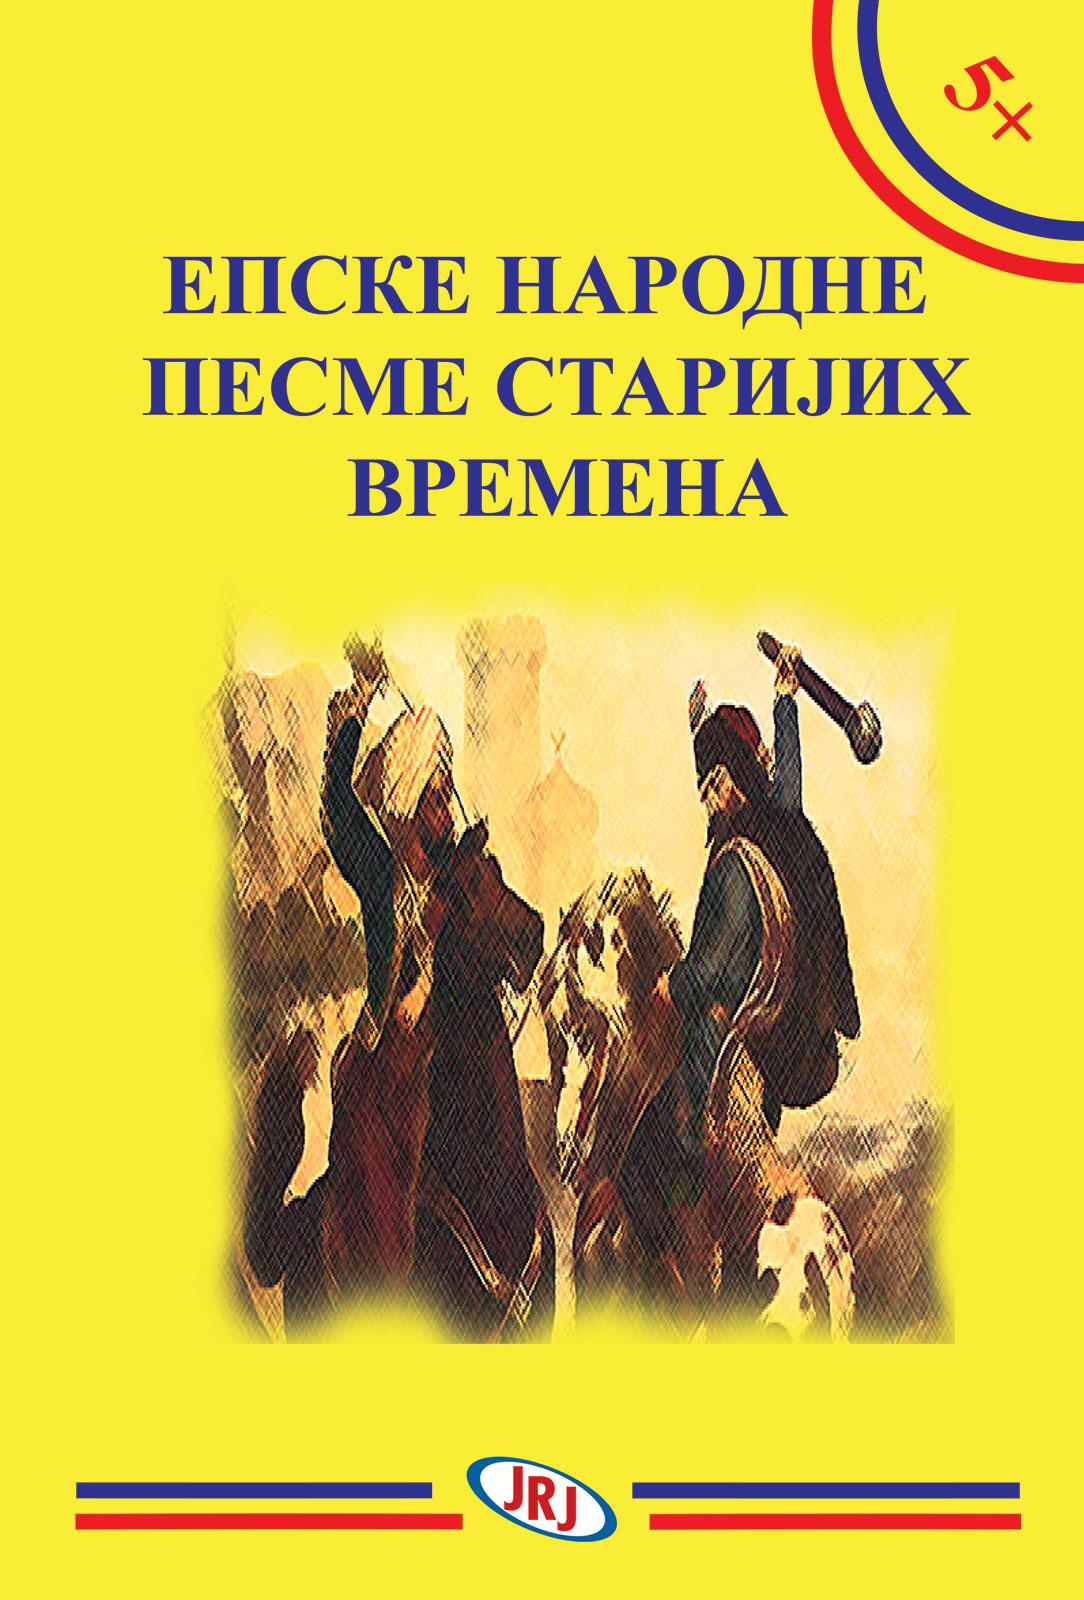 Epske narodne pesme starijih vremena - lektira